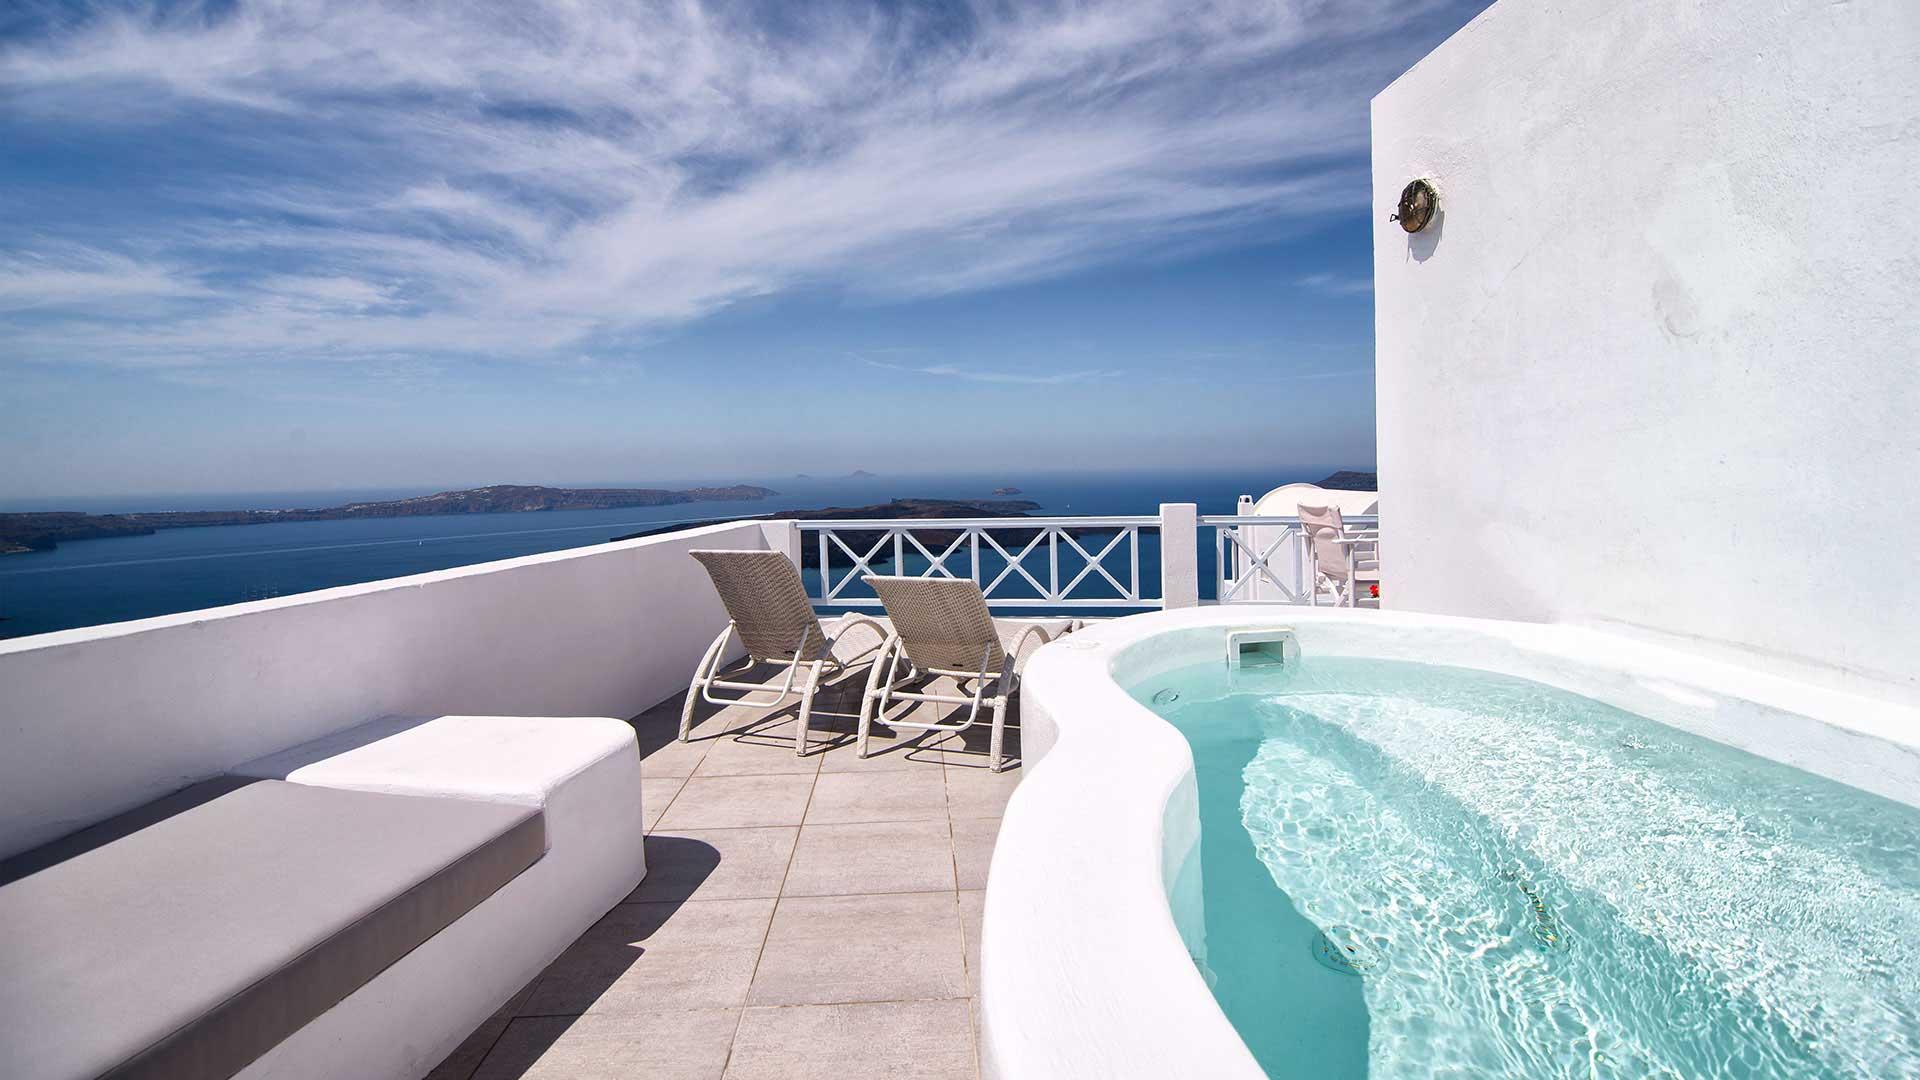 Santorini honeymoon Suite with jacuzzi | Pool with view Imerovigli and Caldera